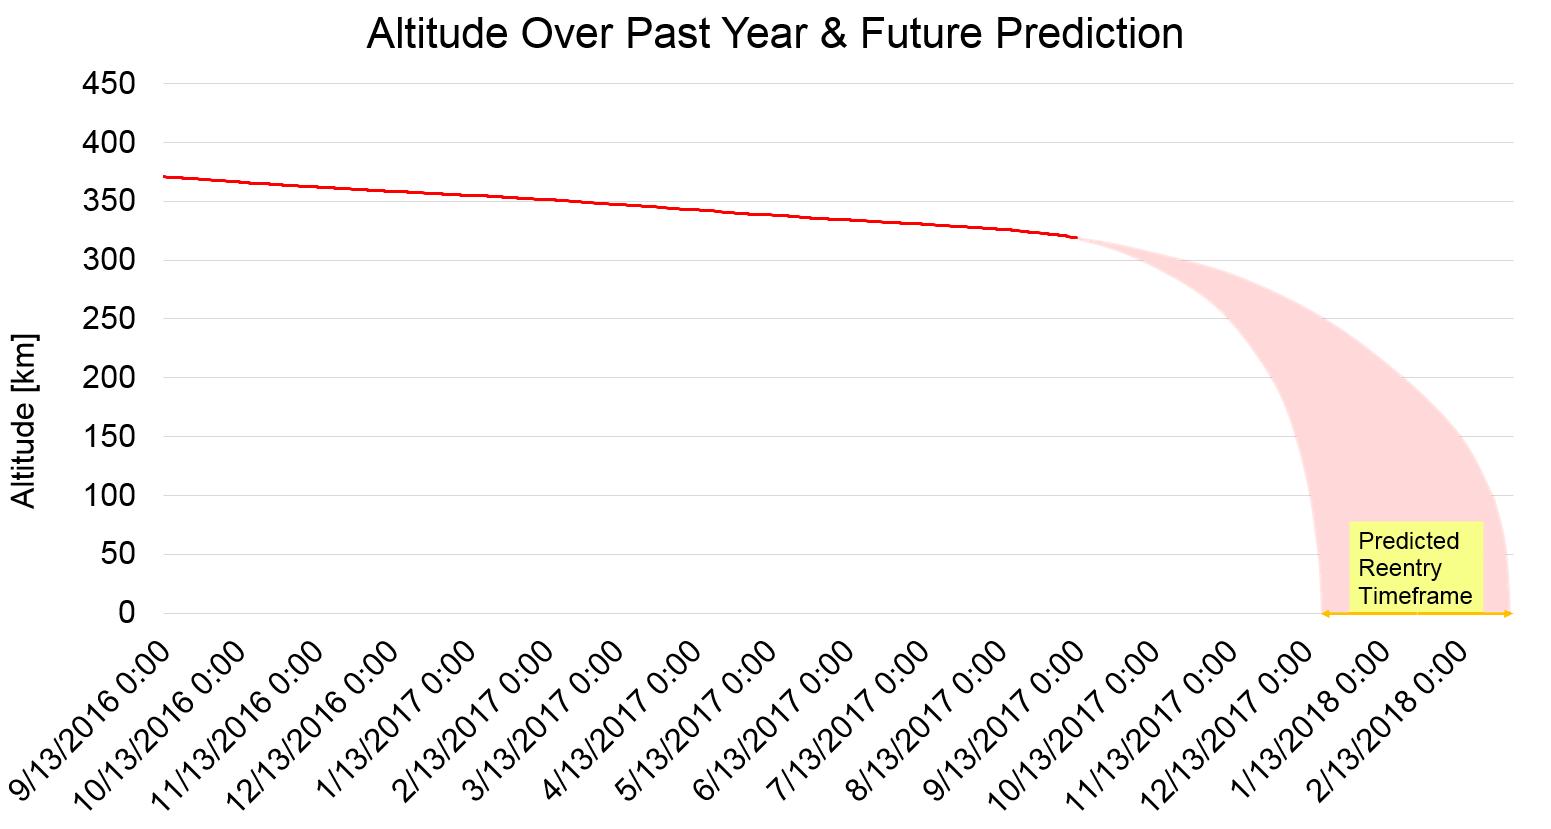 Tiangong 1 re-entry prediction.